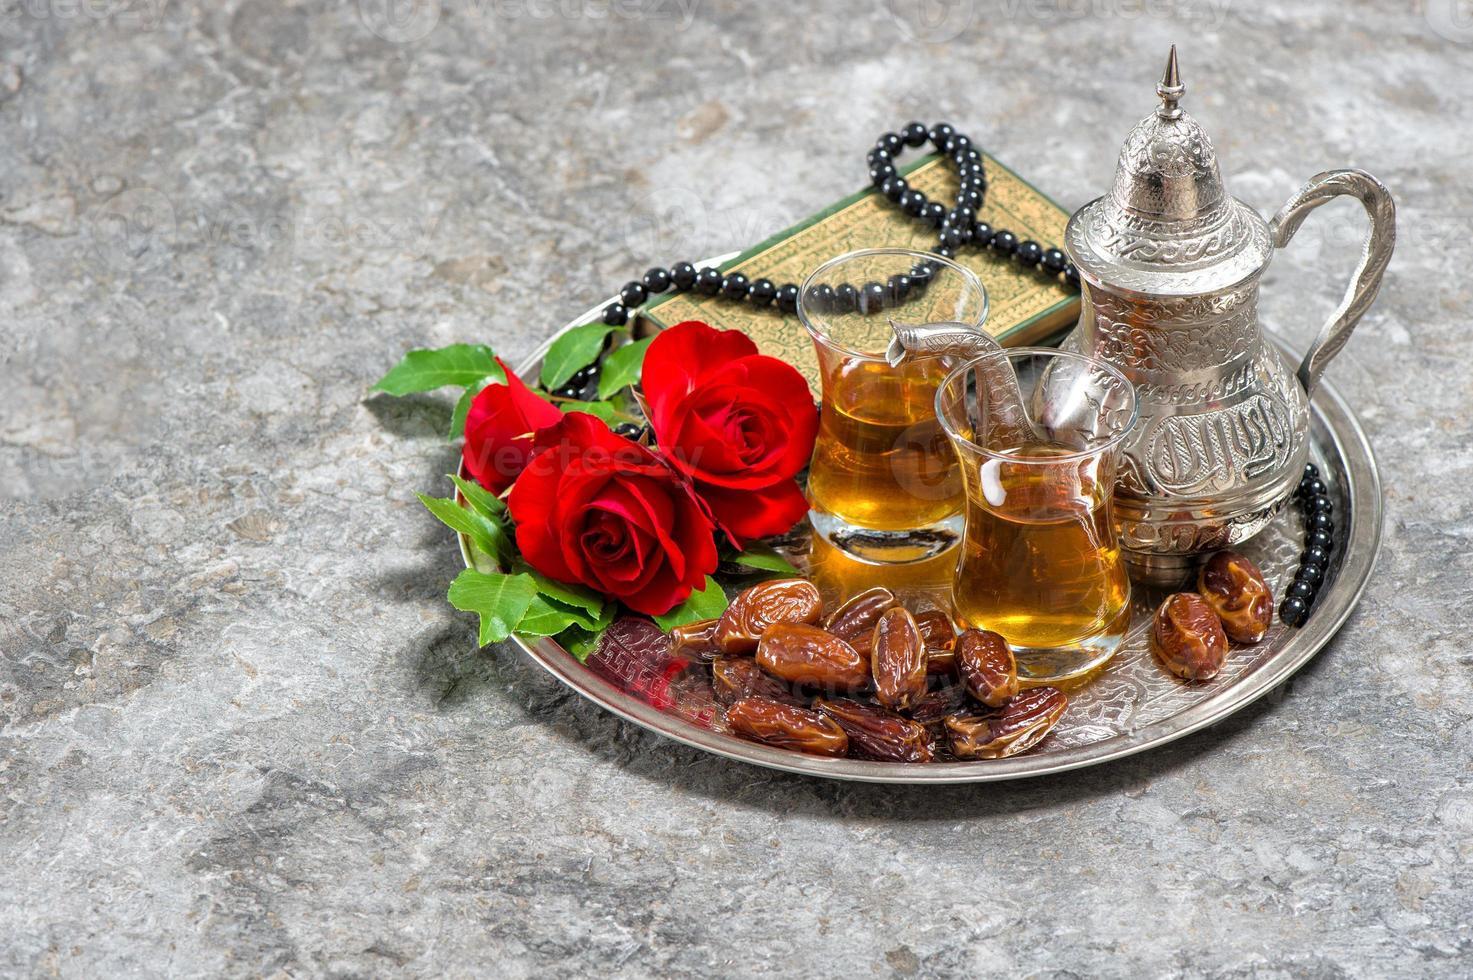 tè, frutti di dattero, fiore di rosa rossa foto